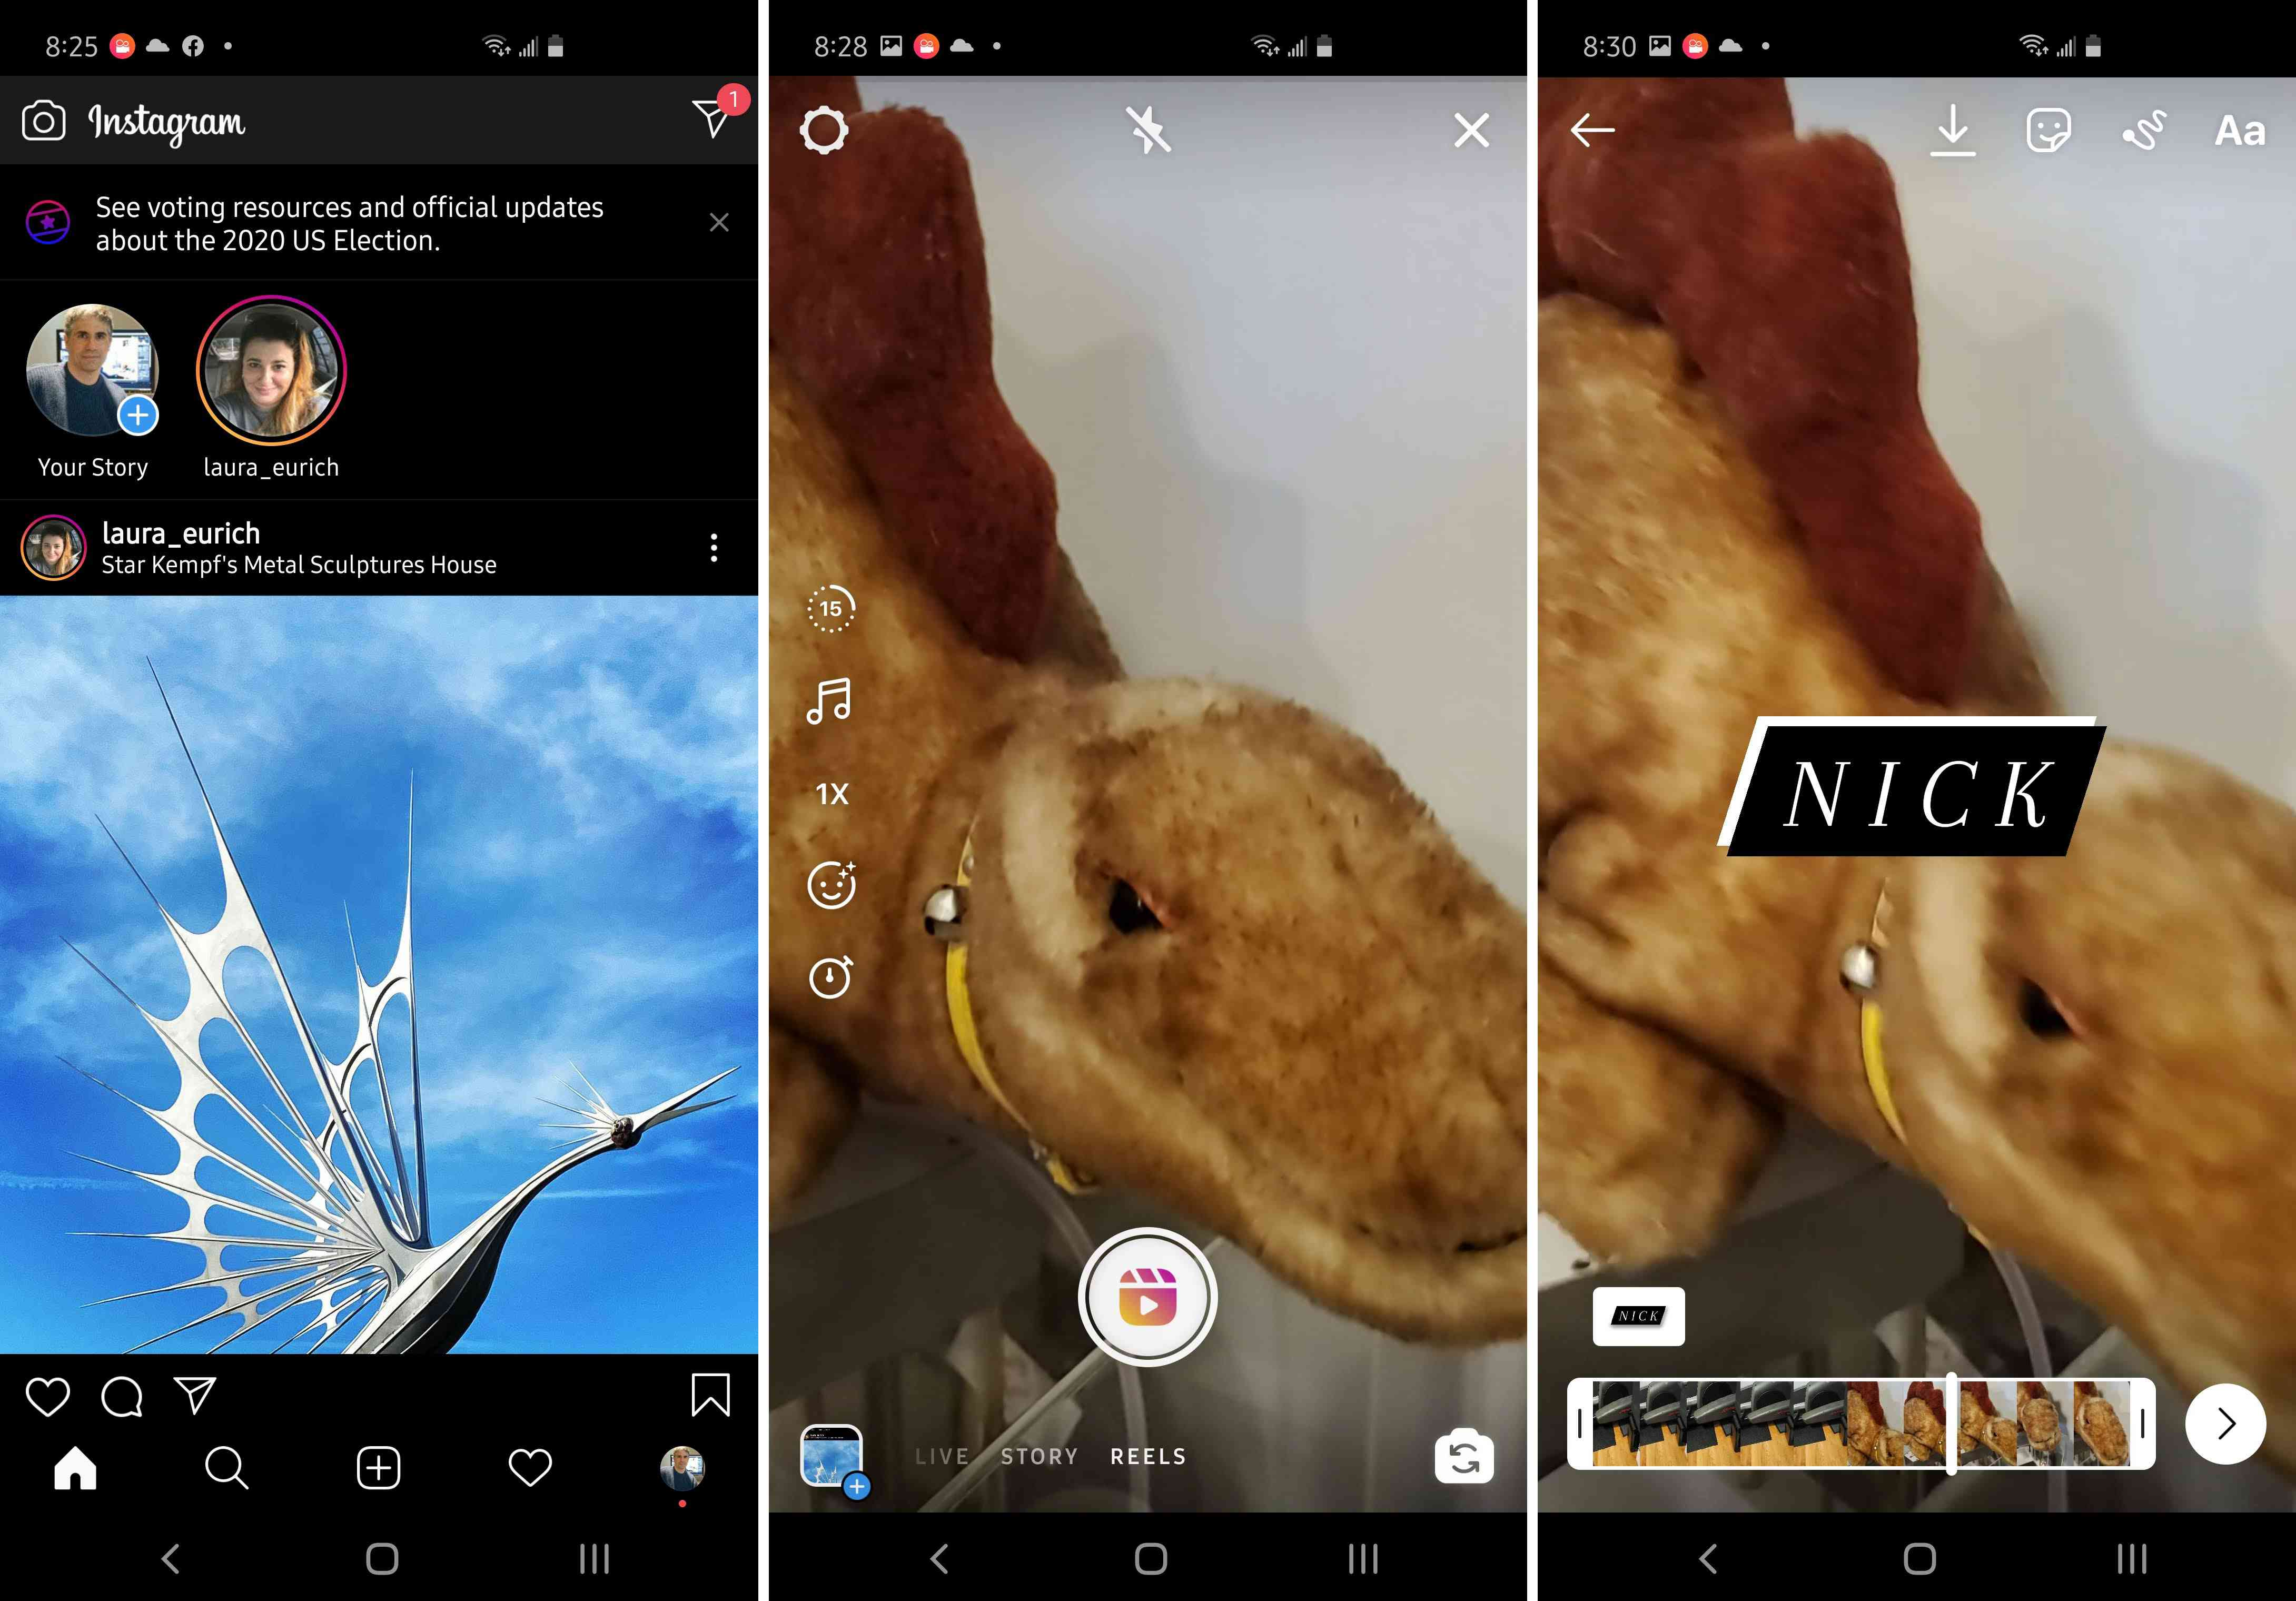 Three views of the Instagram app